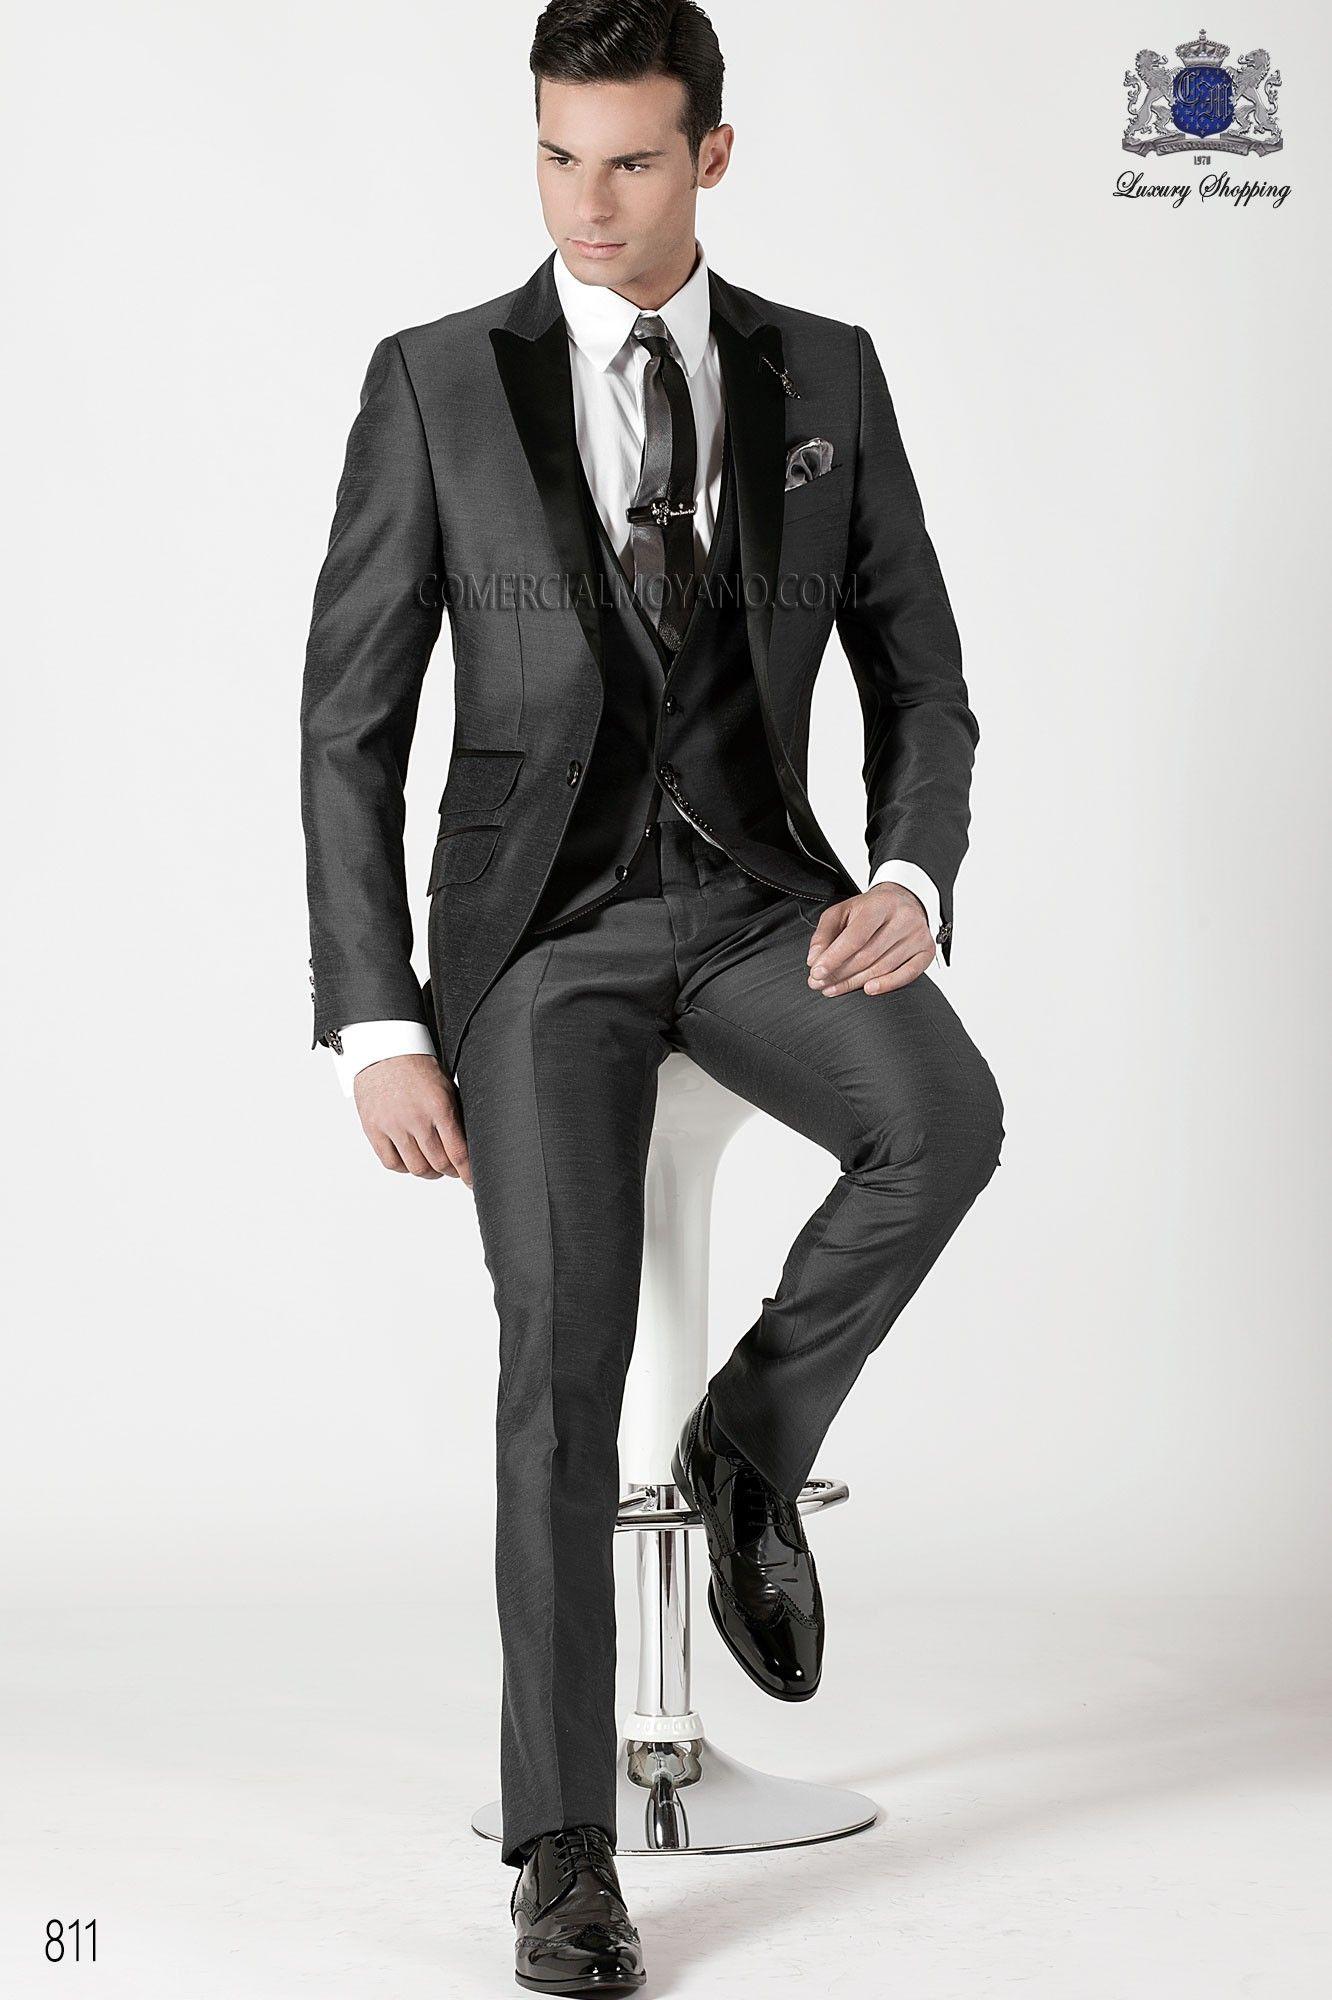 Traje de moda italiano a medida 3 piezas en seda shantung gris 6b4da7d43e9